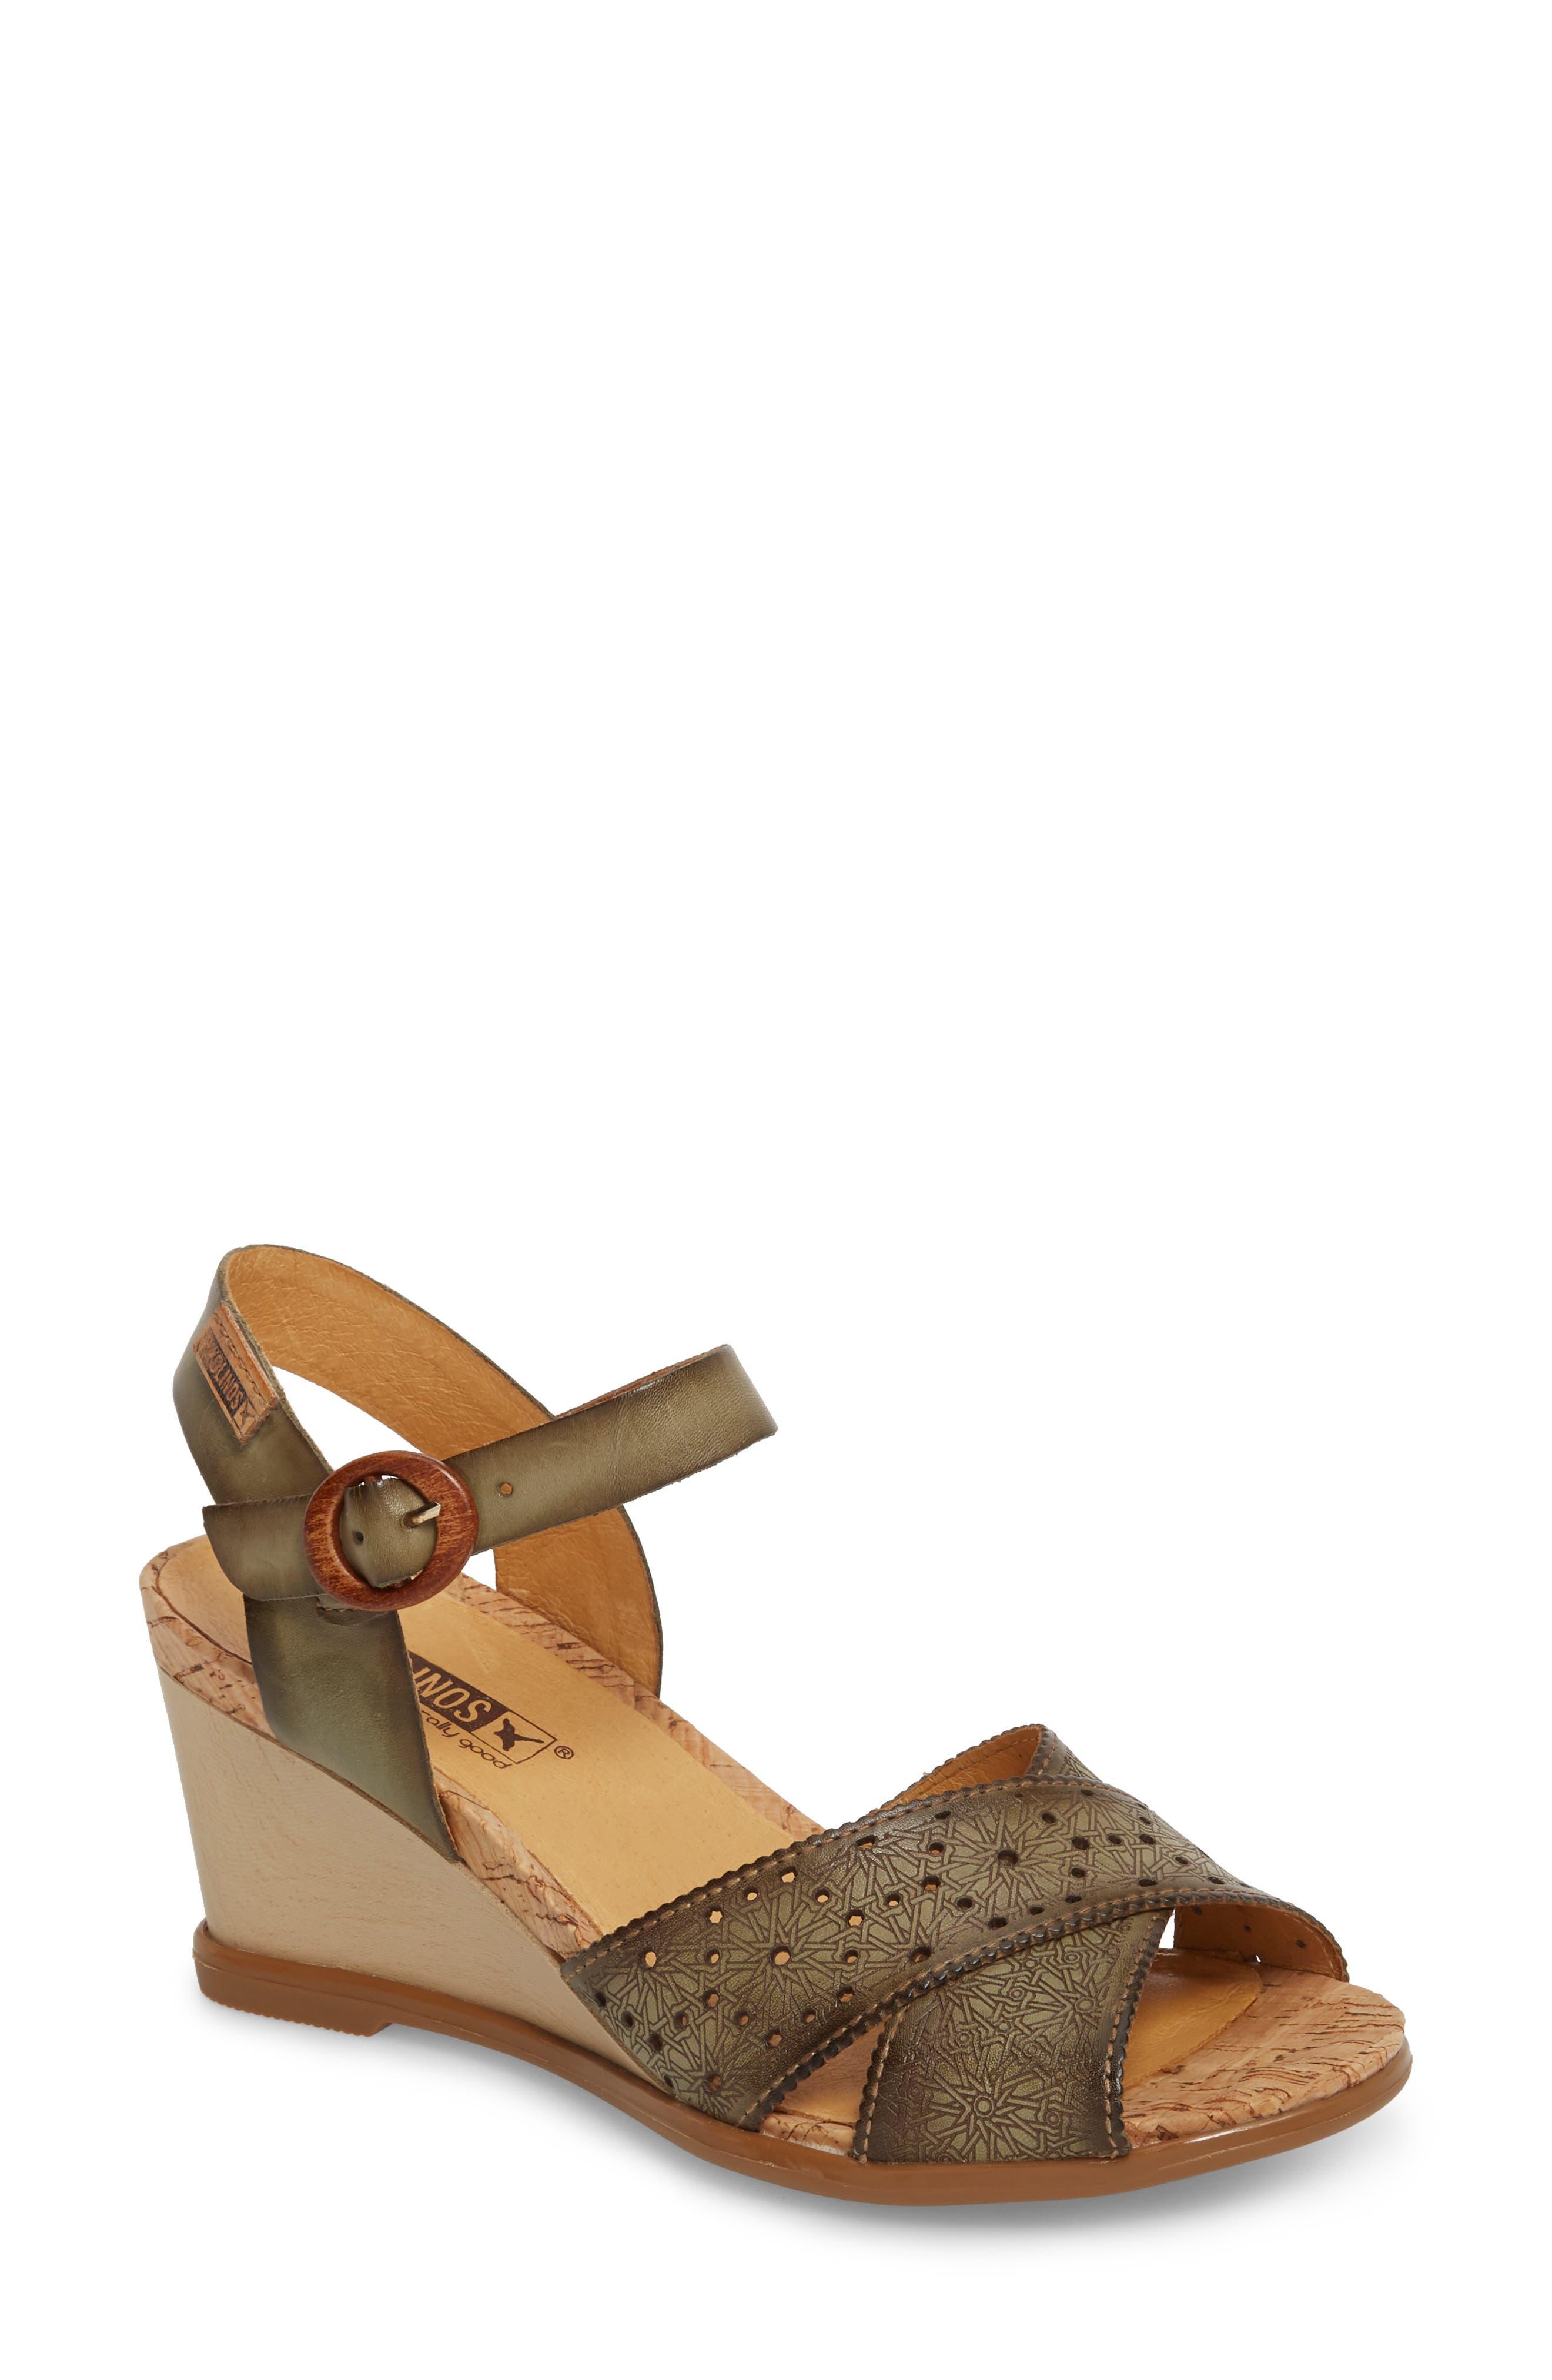 Pikolinos Vigo Wedge Sandal, Metallic